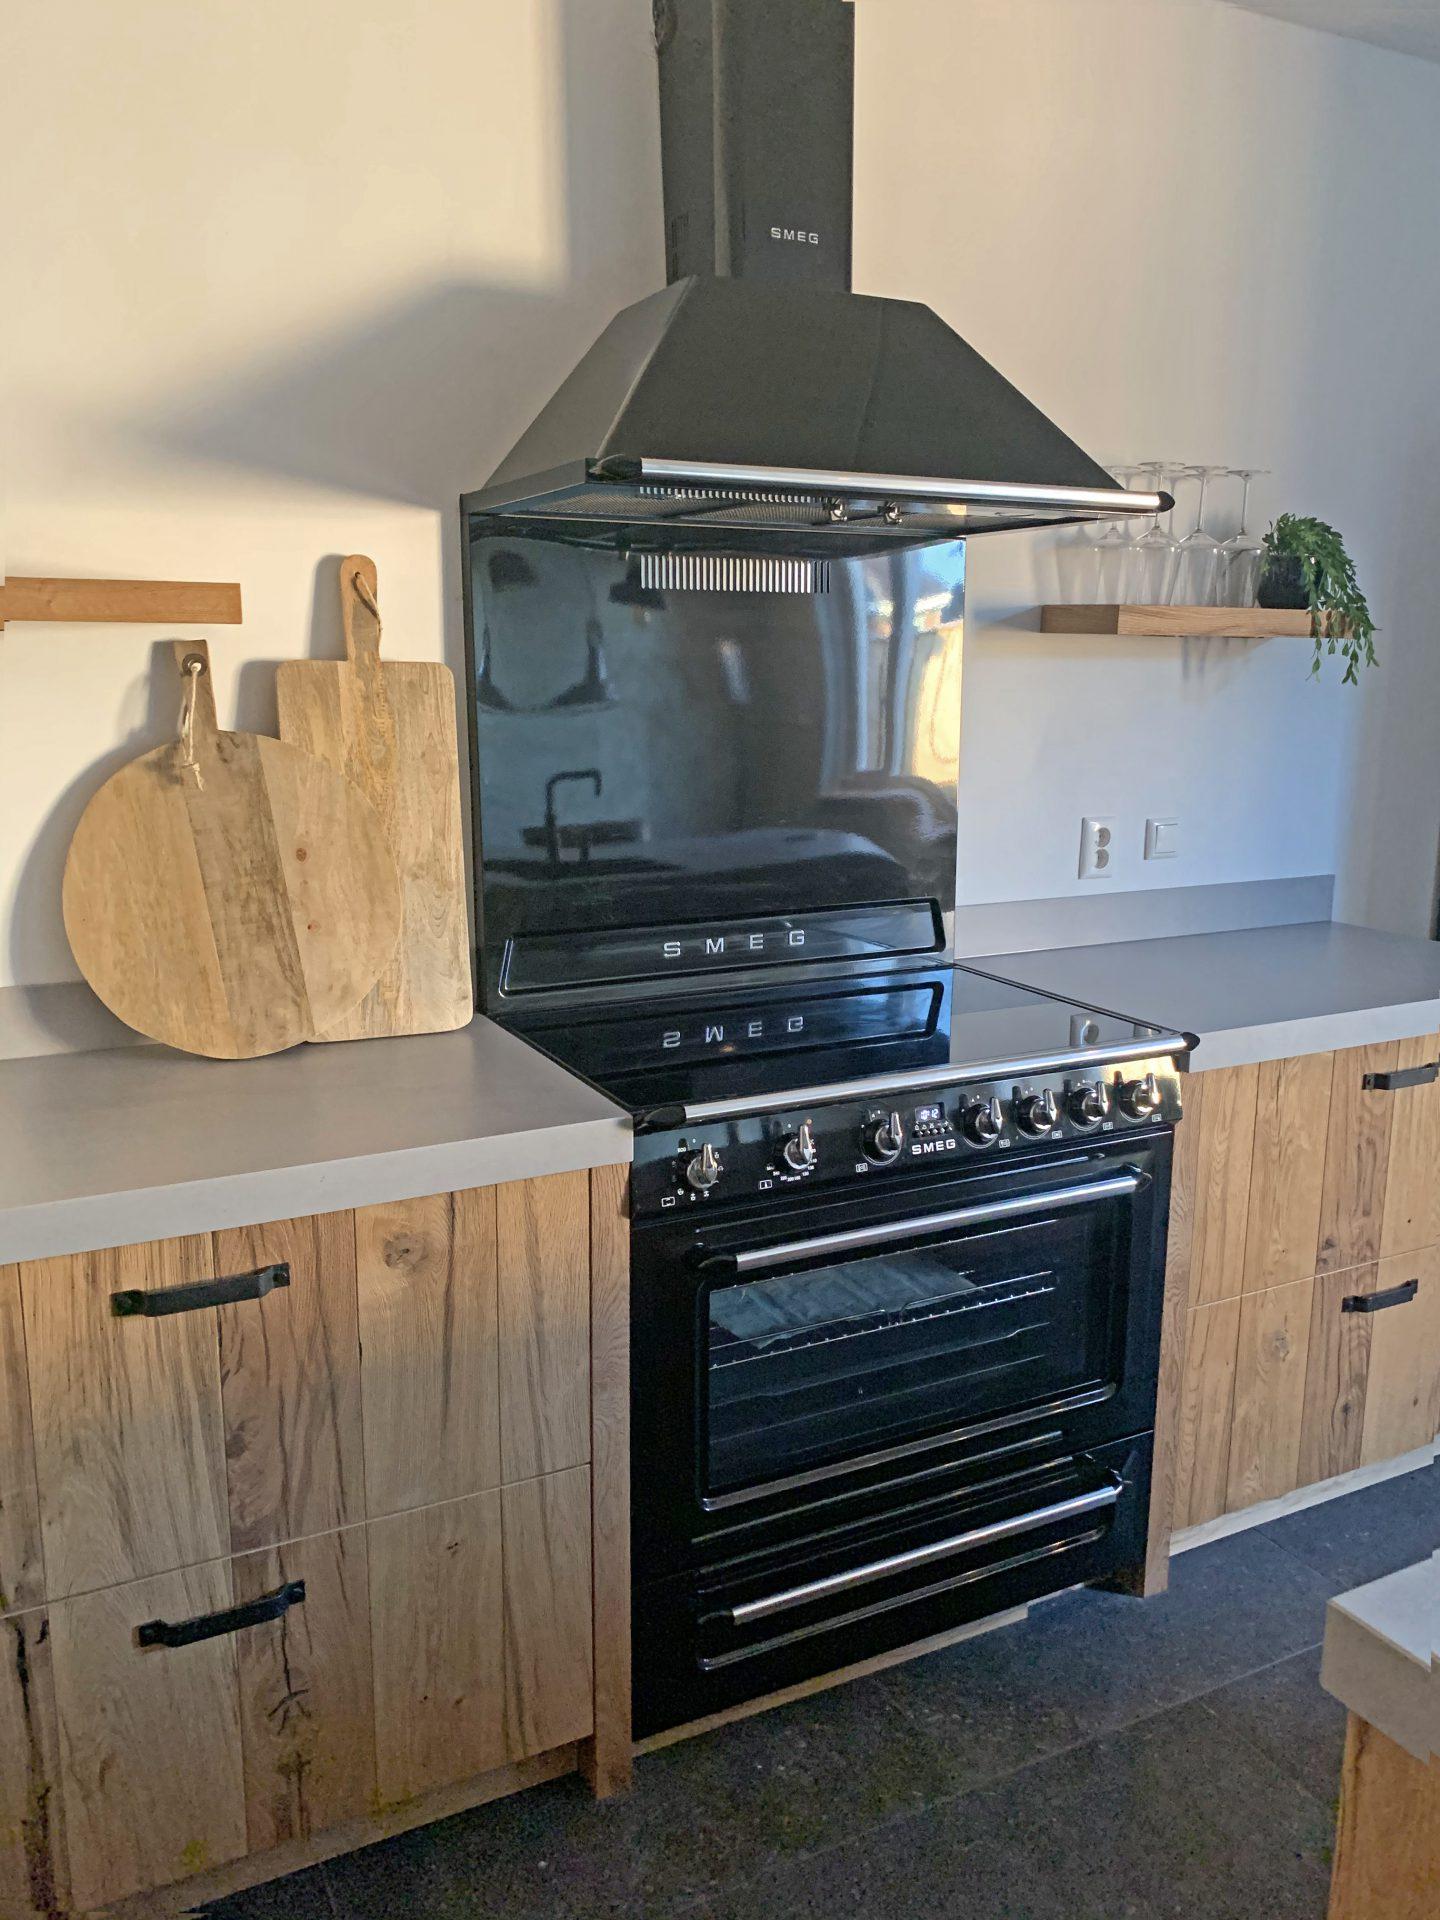 Houten keuken met SMEG fornuis